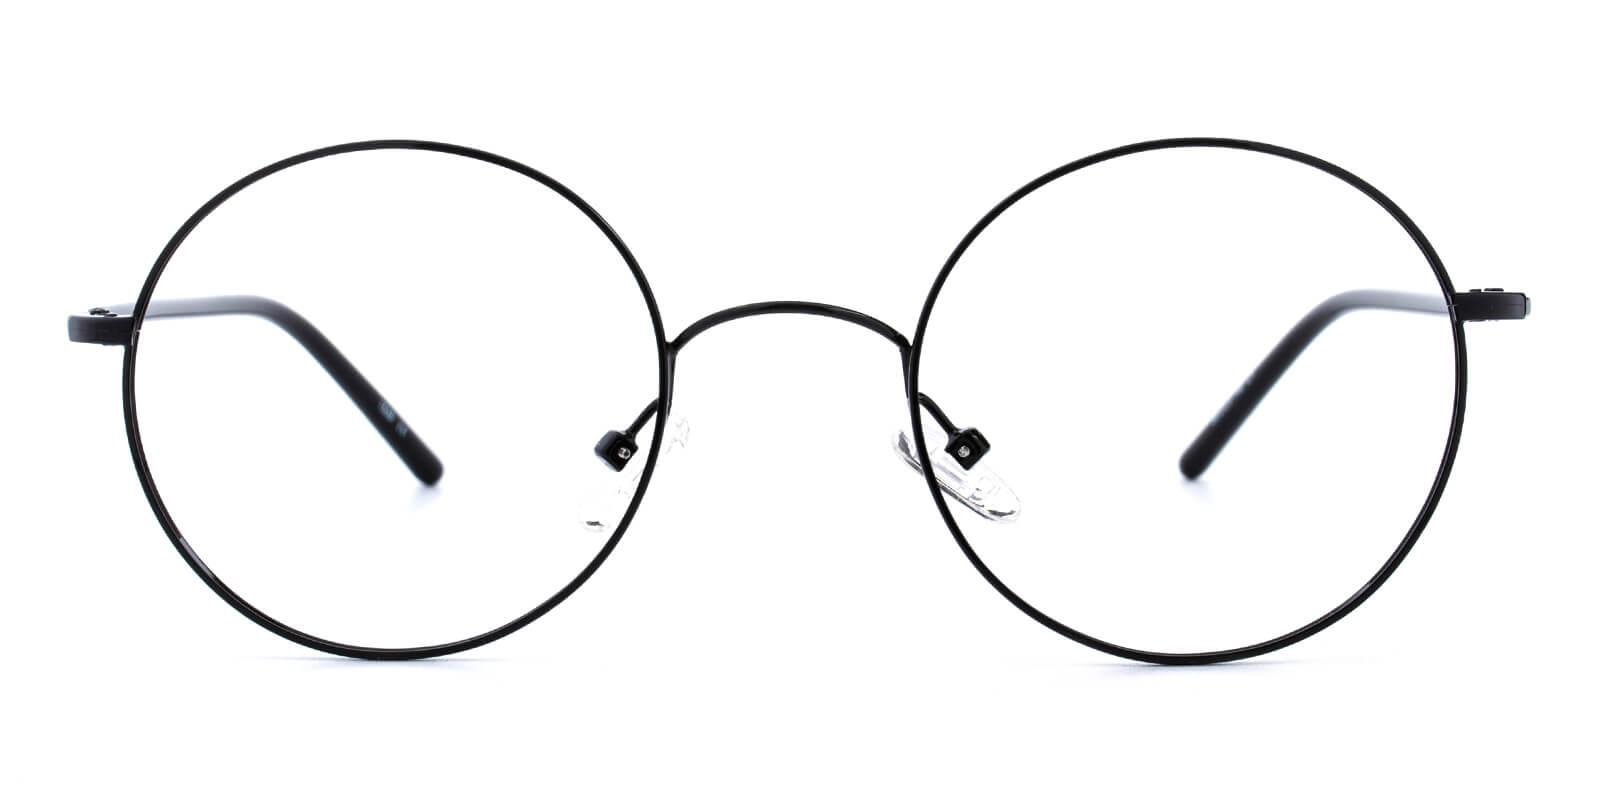 Madison-Black-Round-Metal-Eyeglasses-additional2